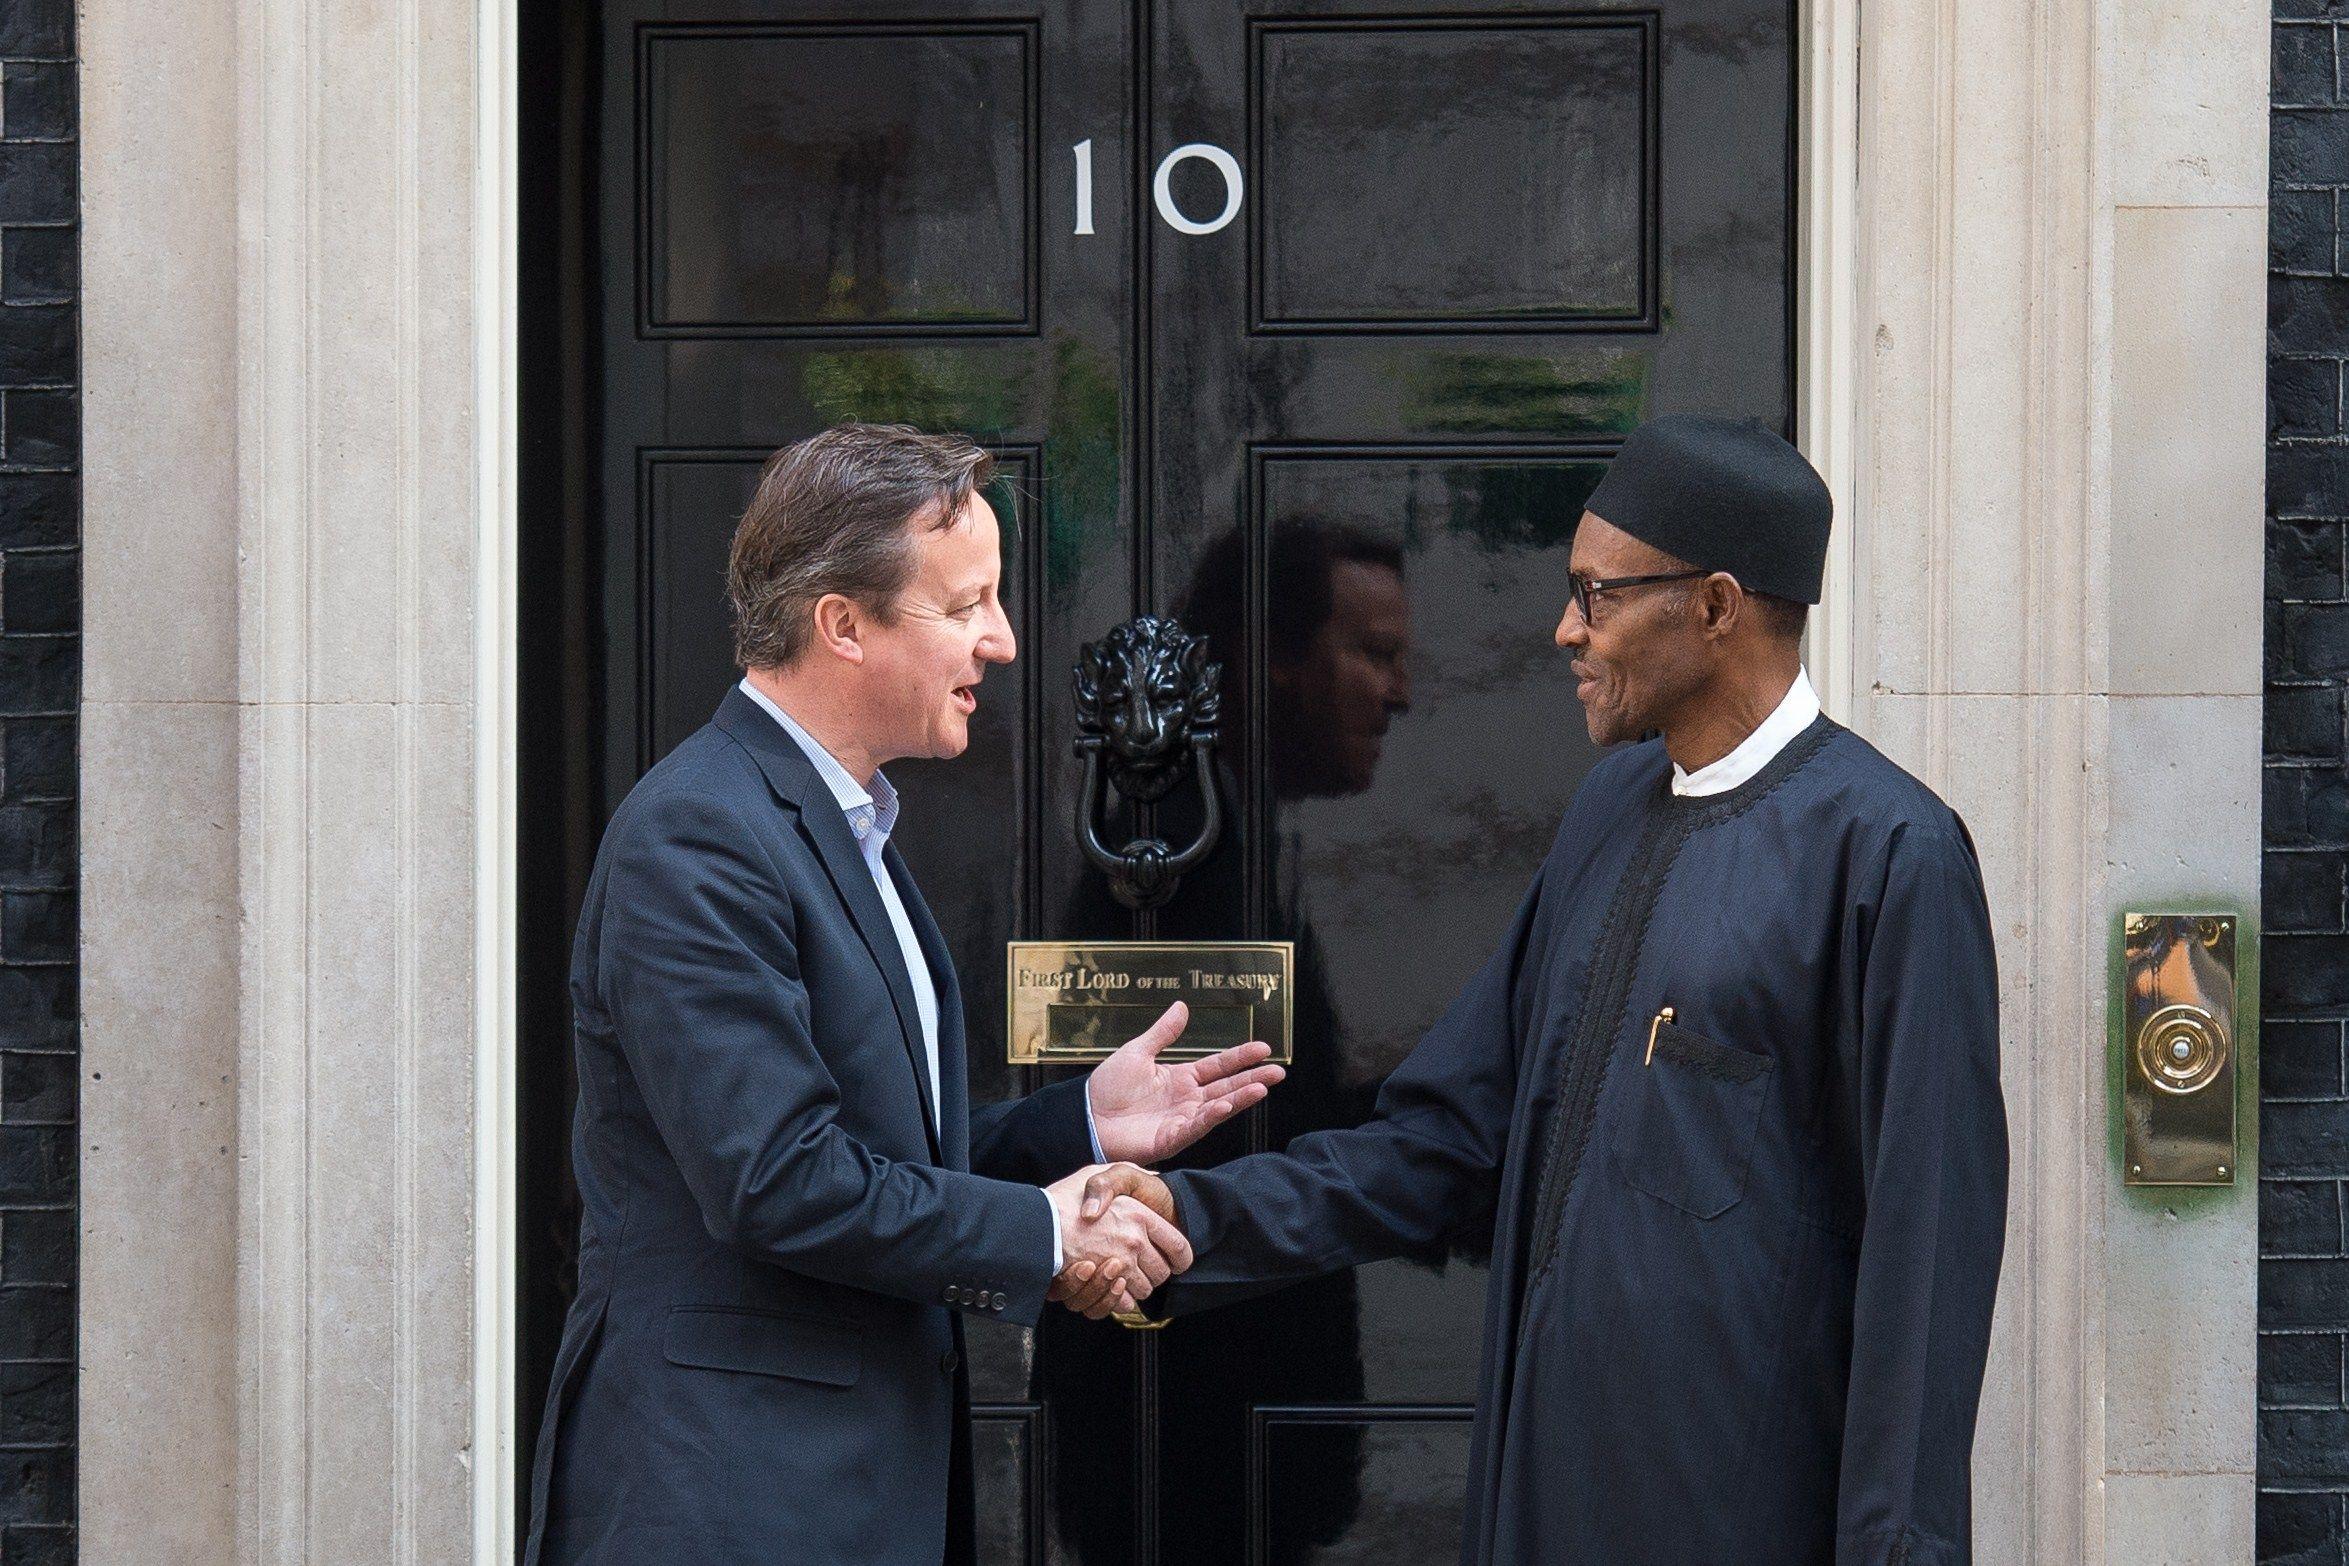 Muhammadu Buhari shakes hands with David Cameron